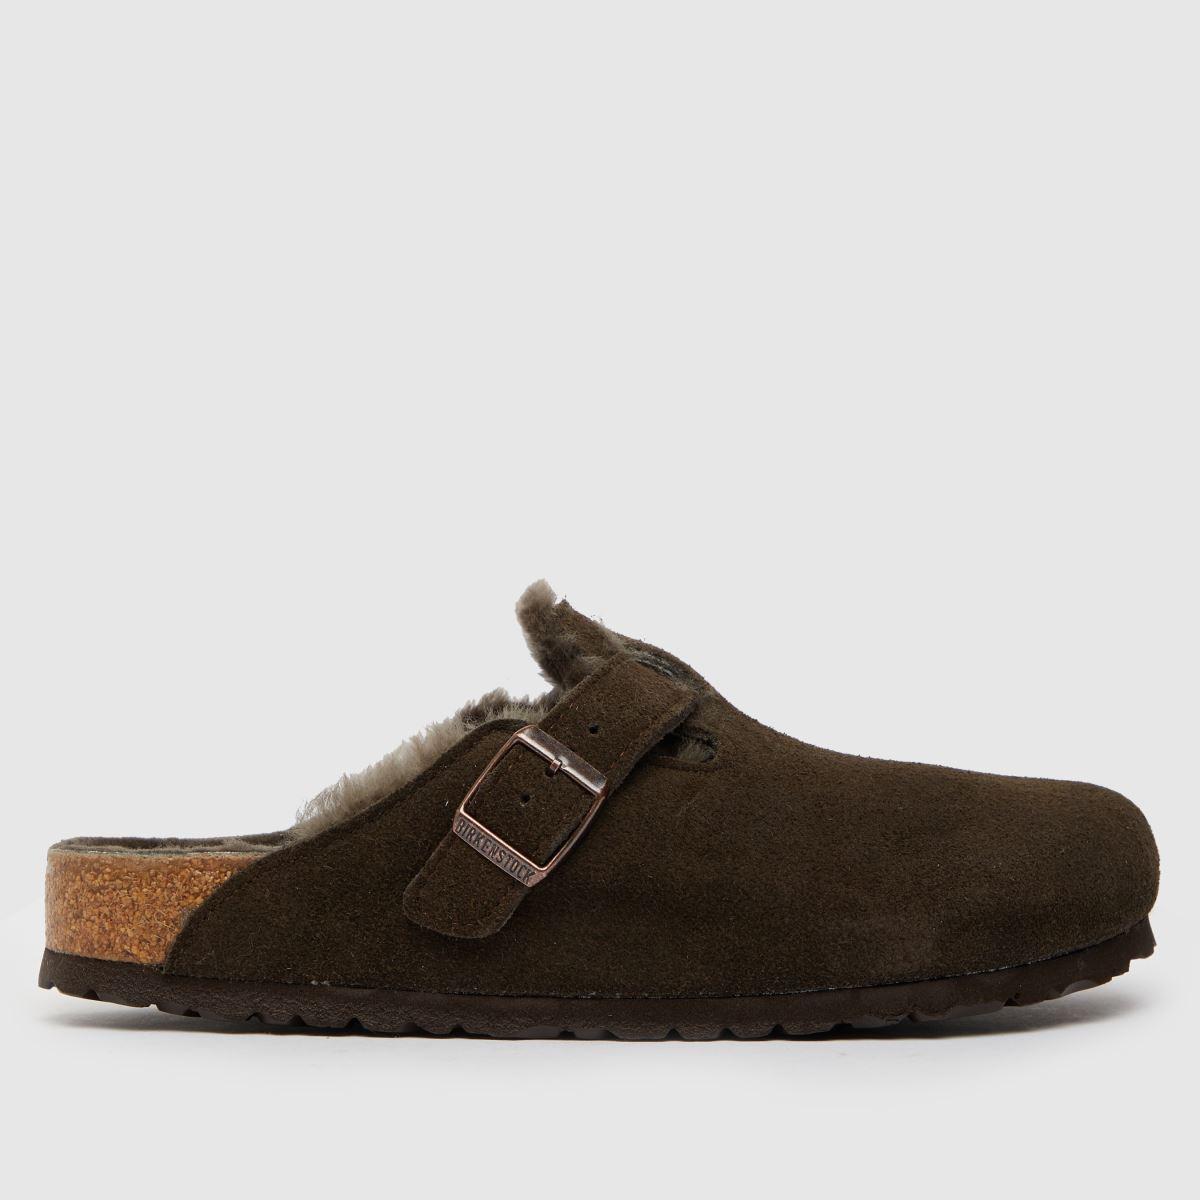 BIRKENSTOCK Brown Boston Shearling Sandals